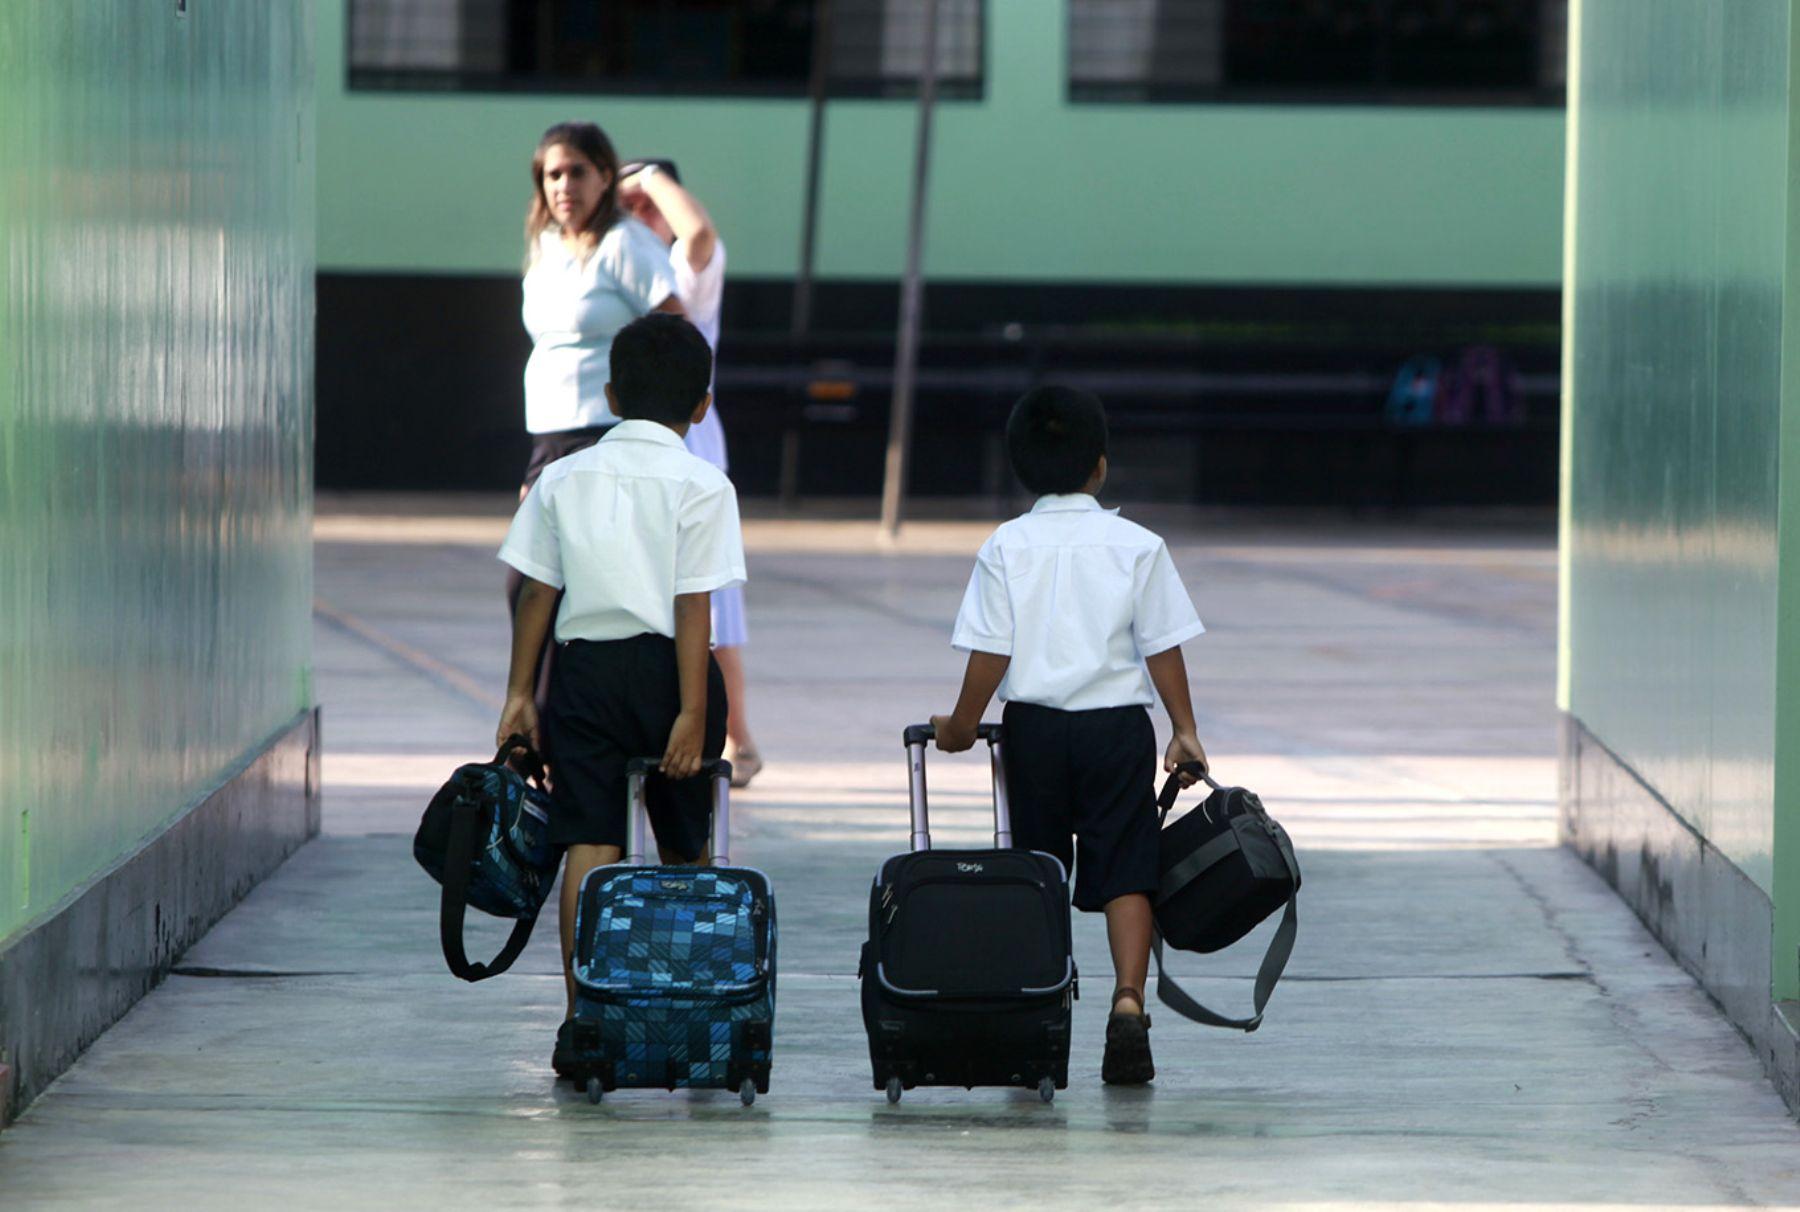 Educación suspende clases en provincias serían afectadas por tormenta tropical Érika